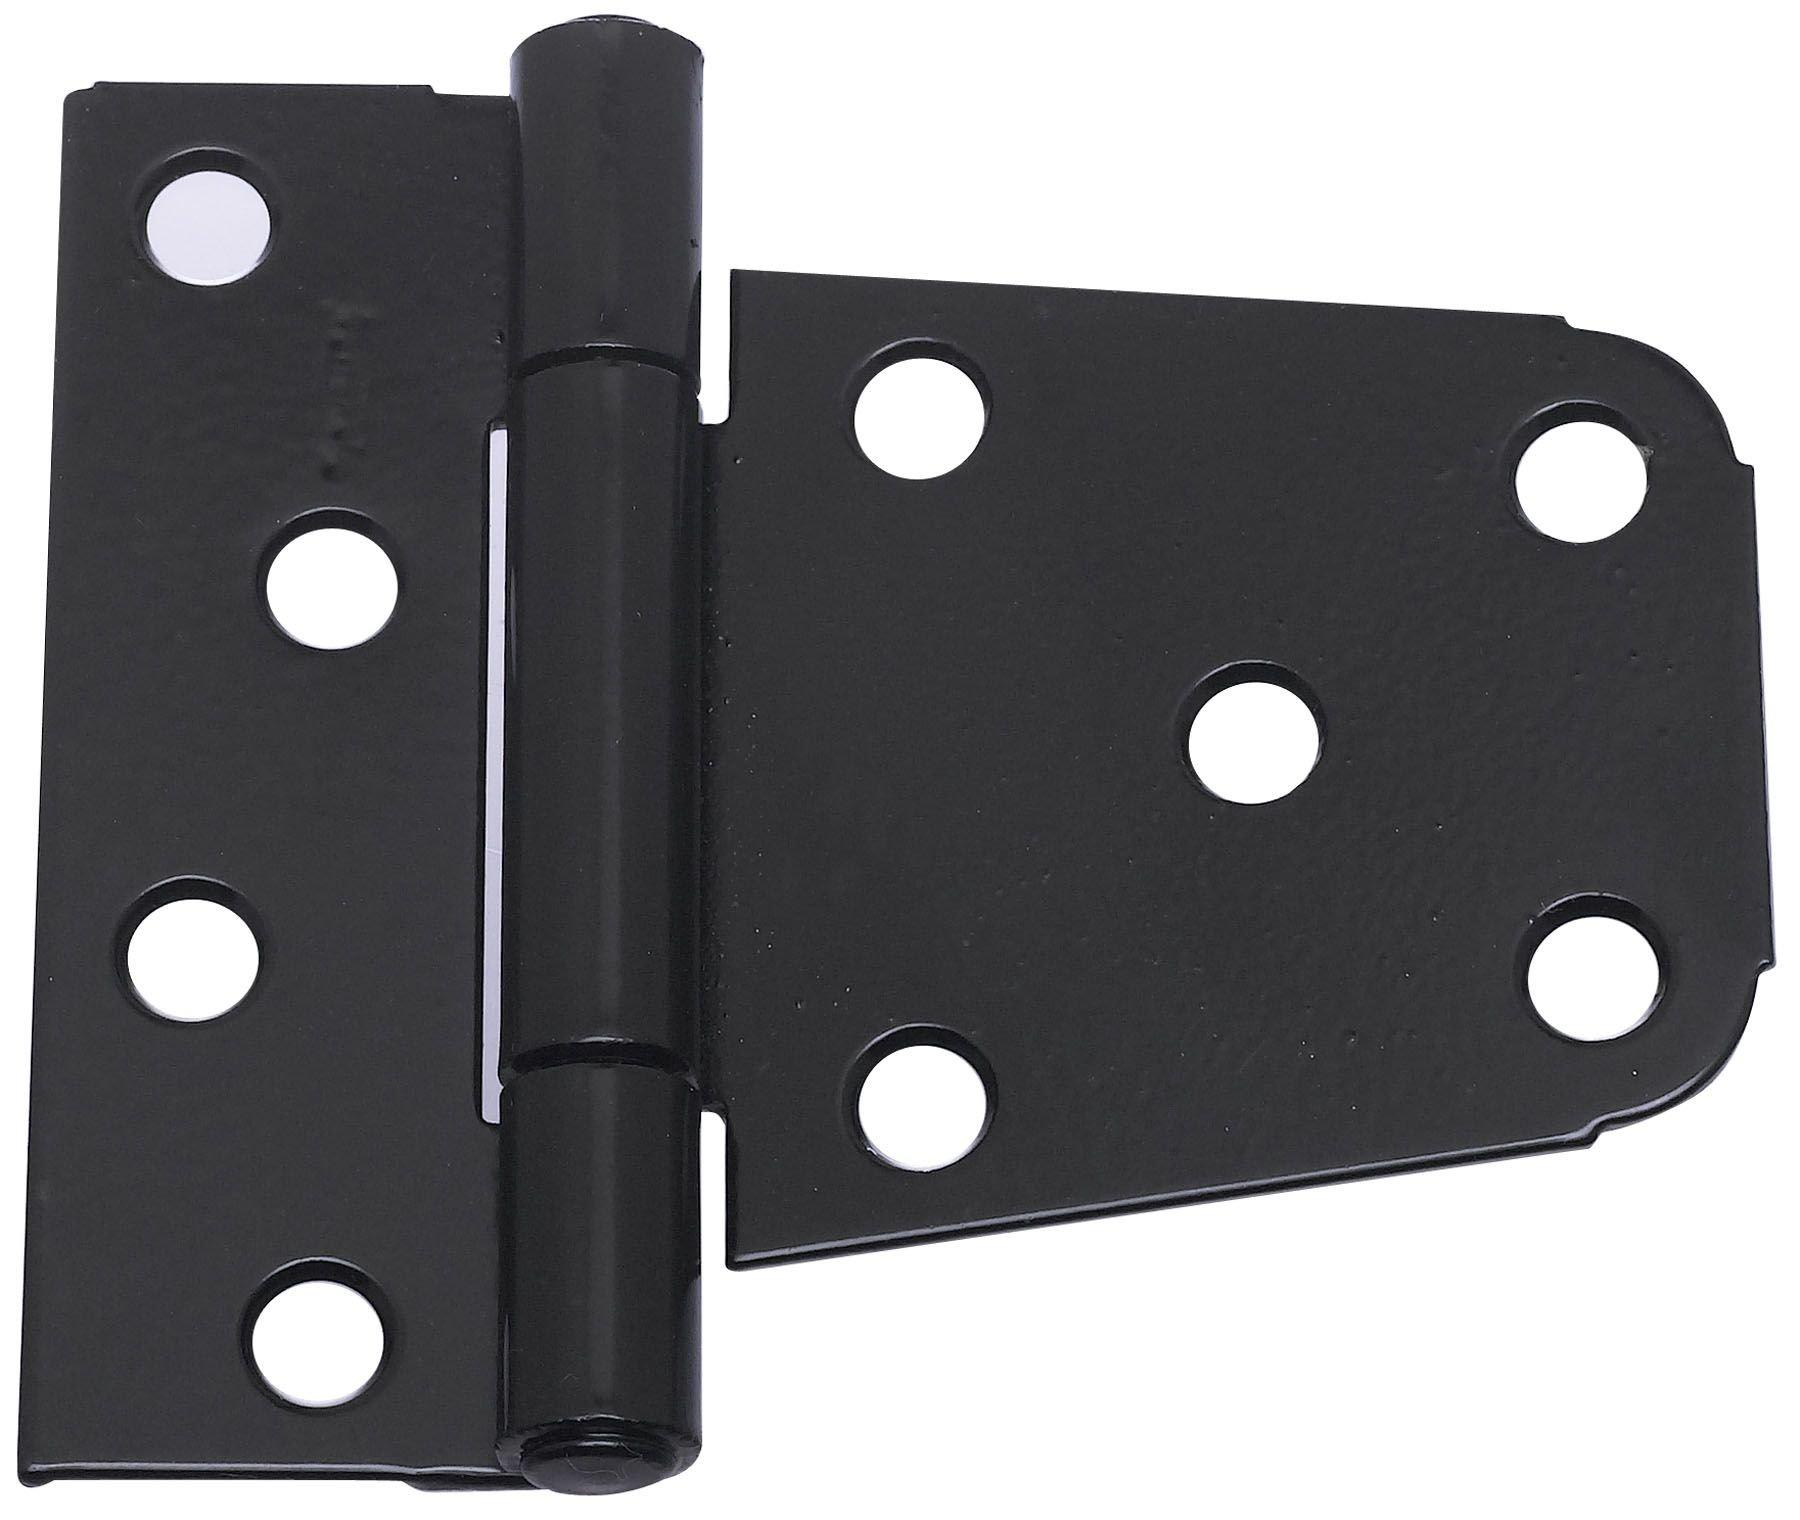 National Hardware N220-129 V287 Extra Heavy Gate Hinges in Black, 2 pack